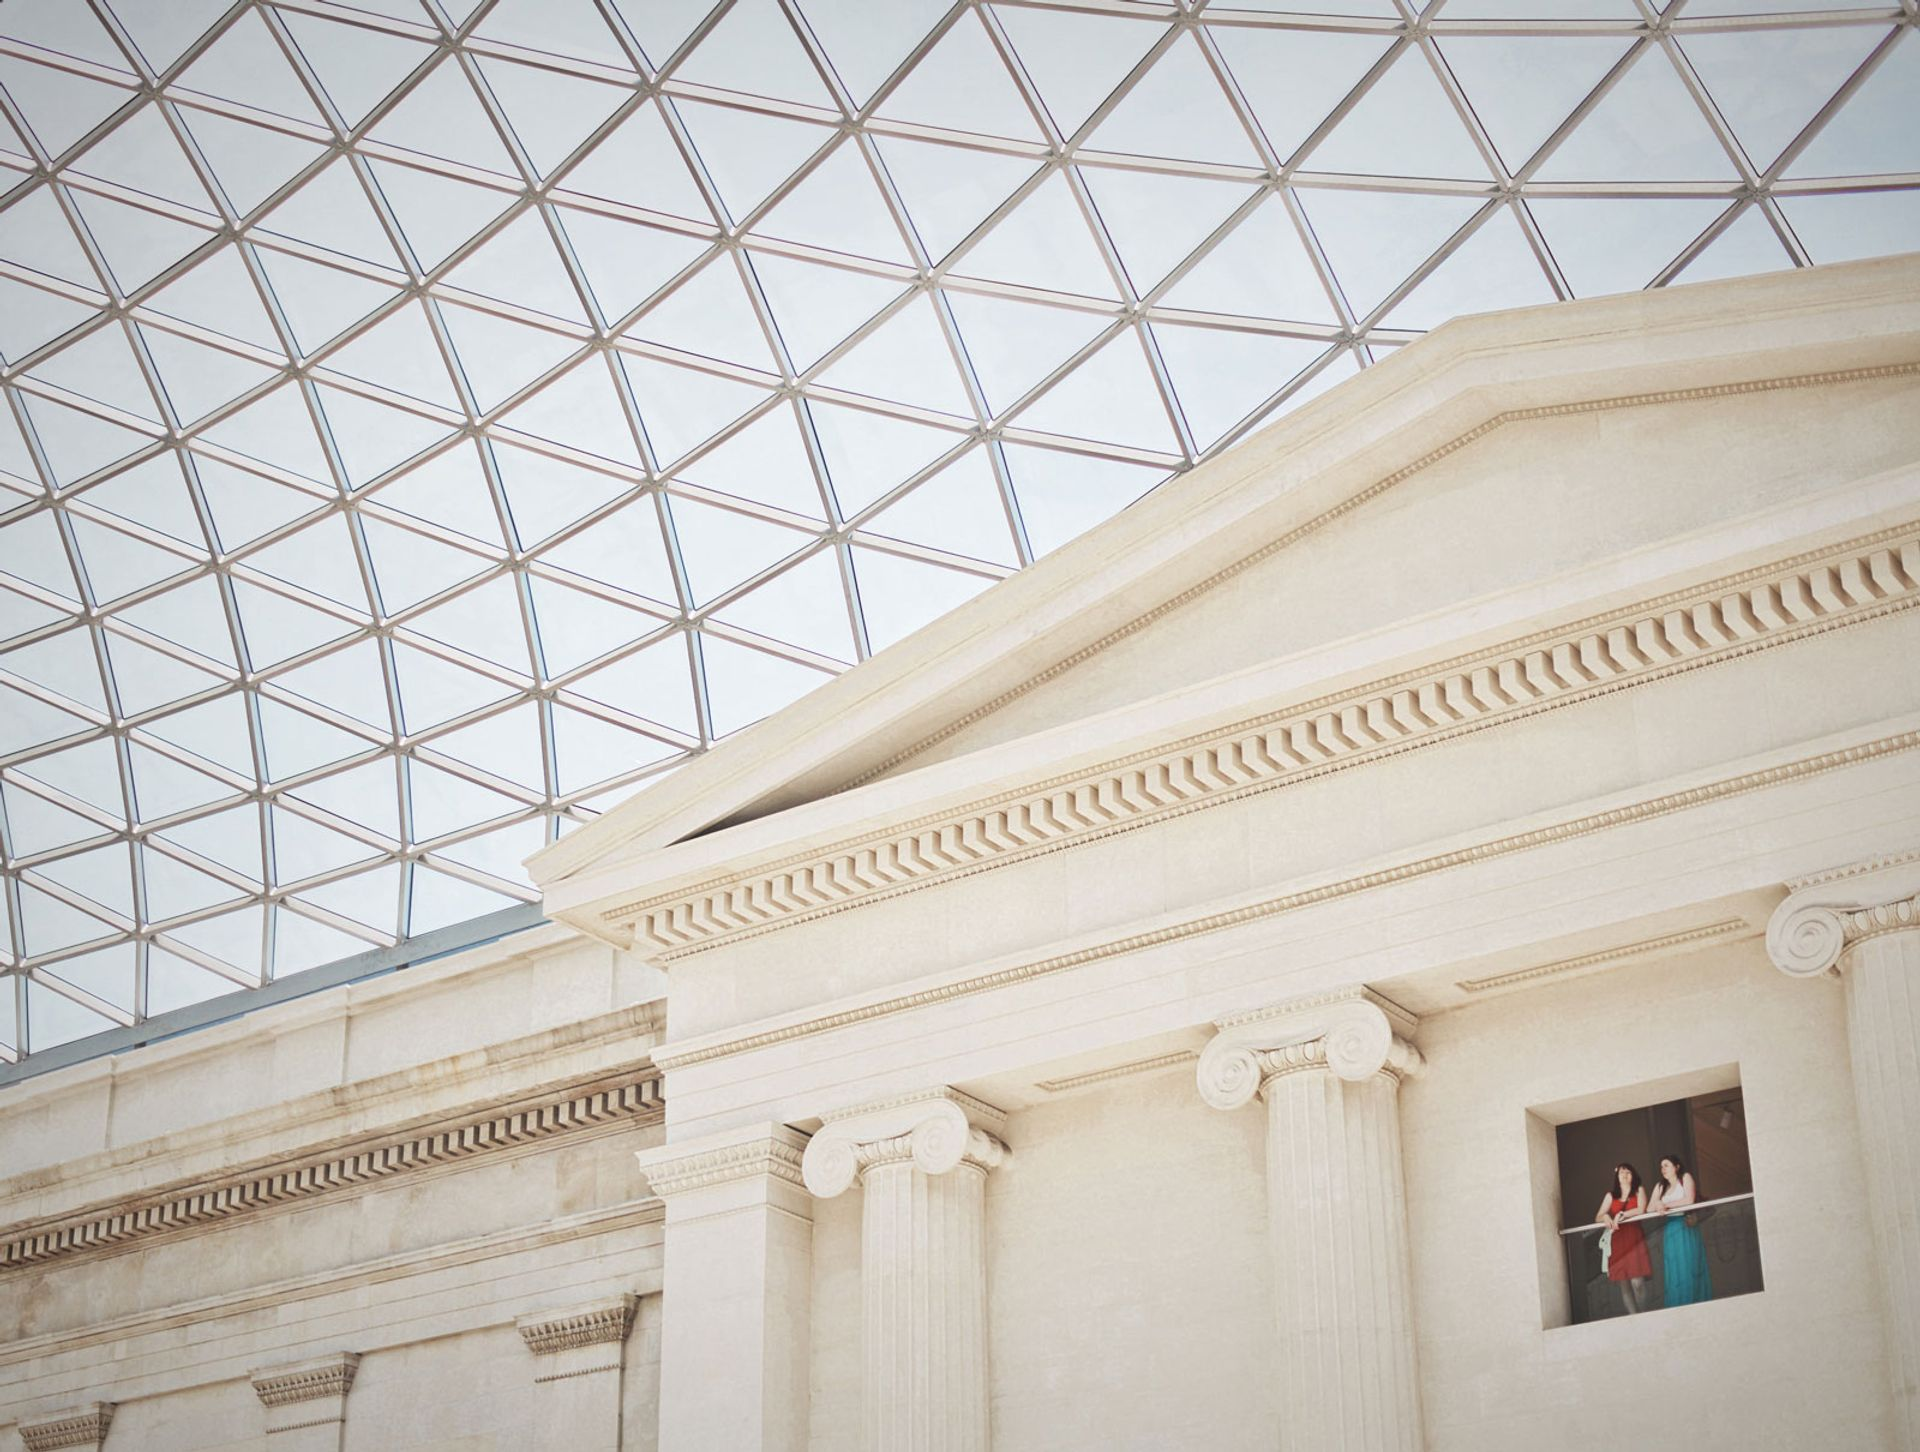 The British Museum recorded incorrect visitor figures © Yuya Hata